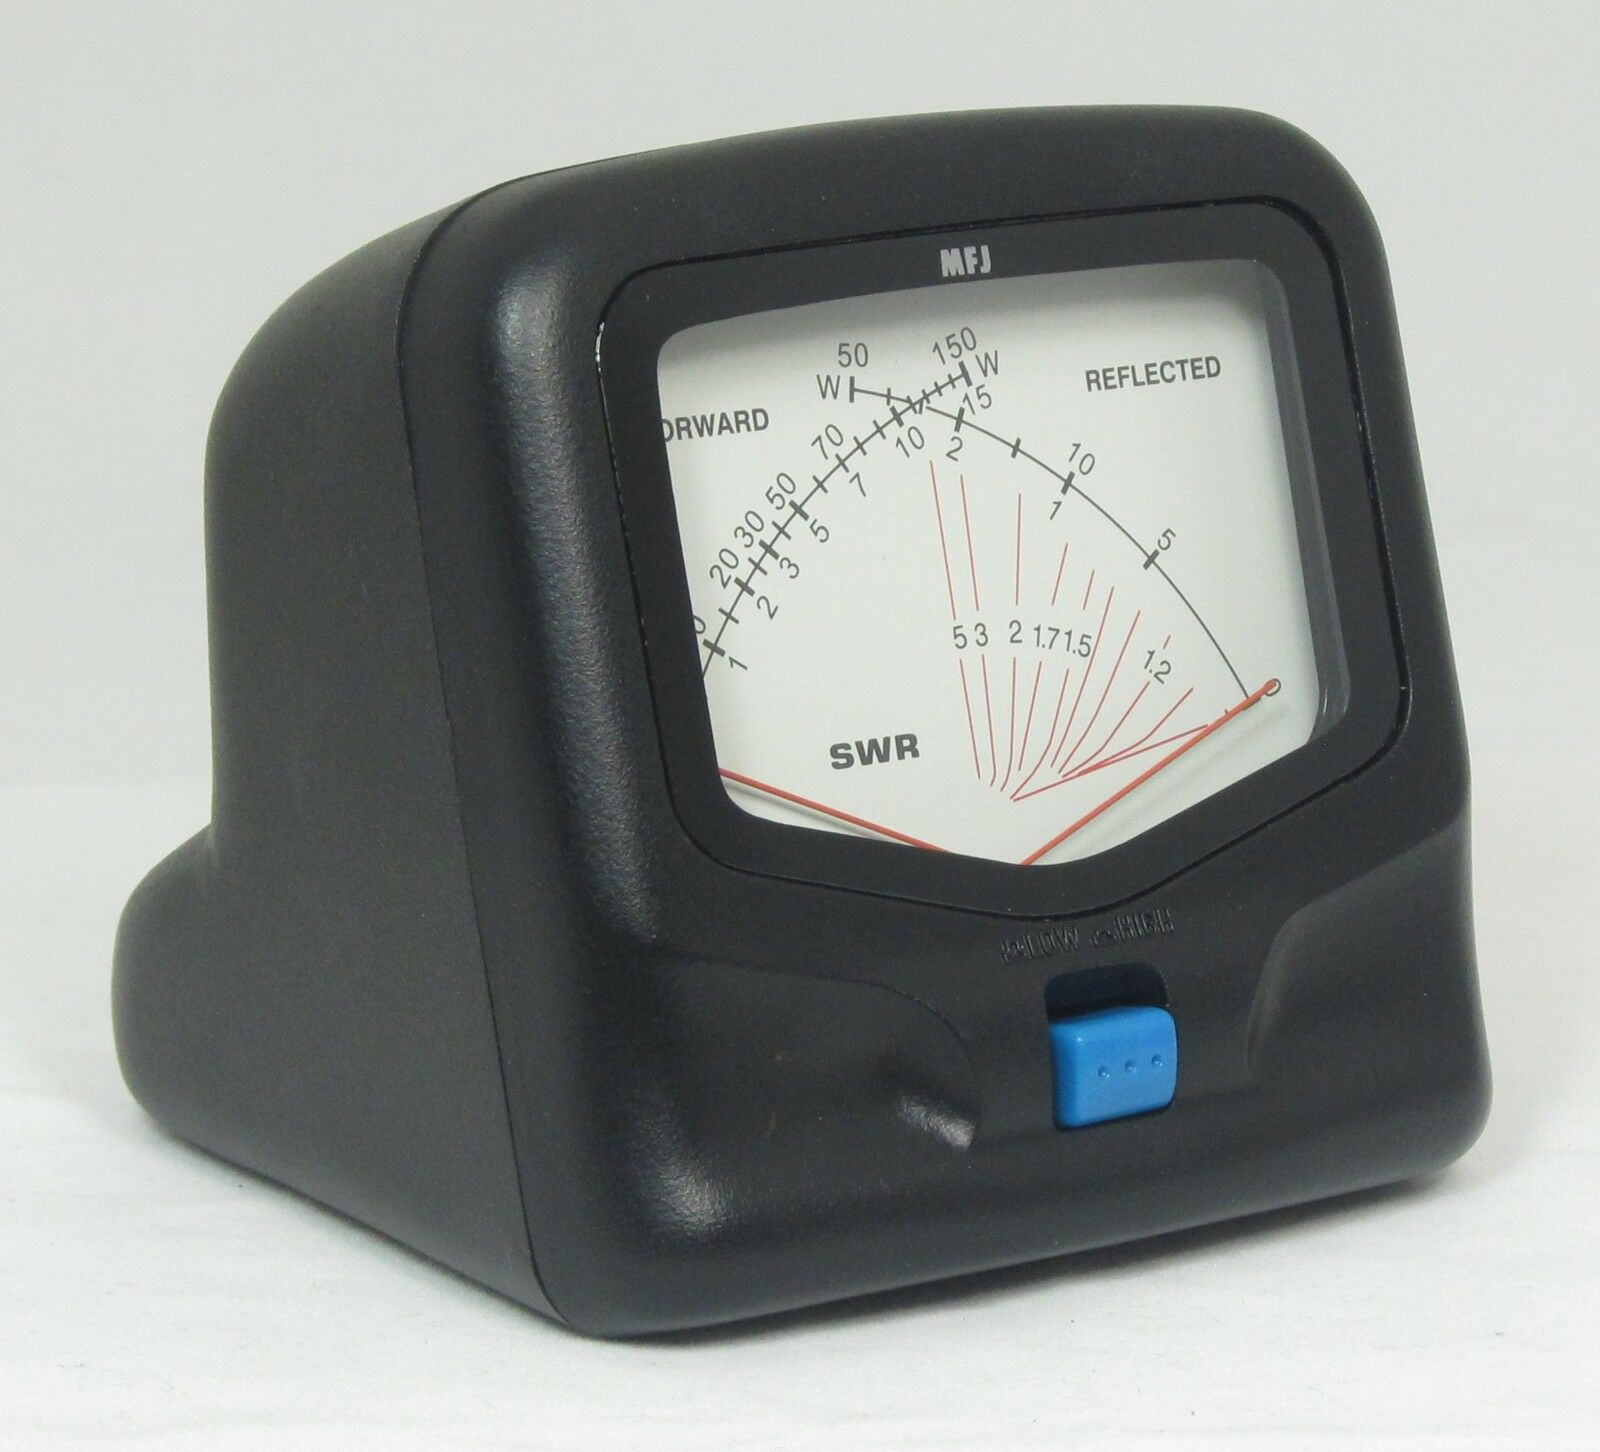 how to read cross needle swr meter